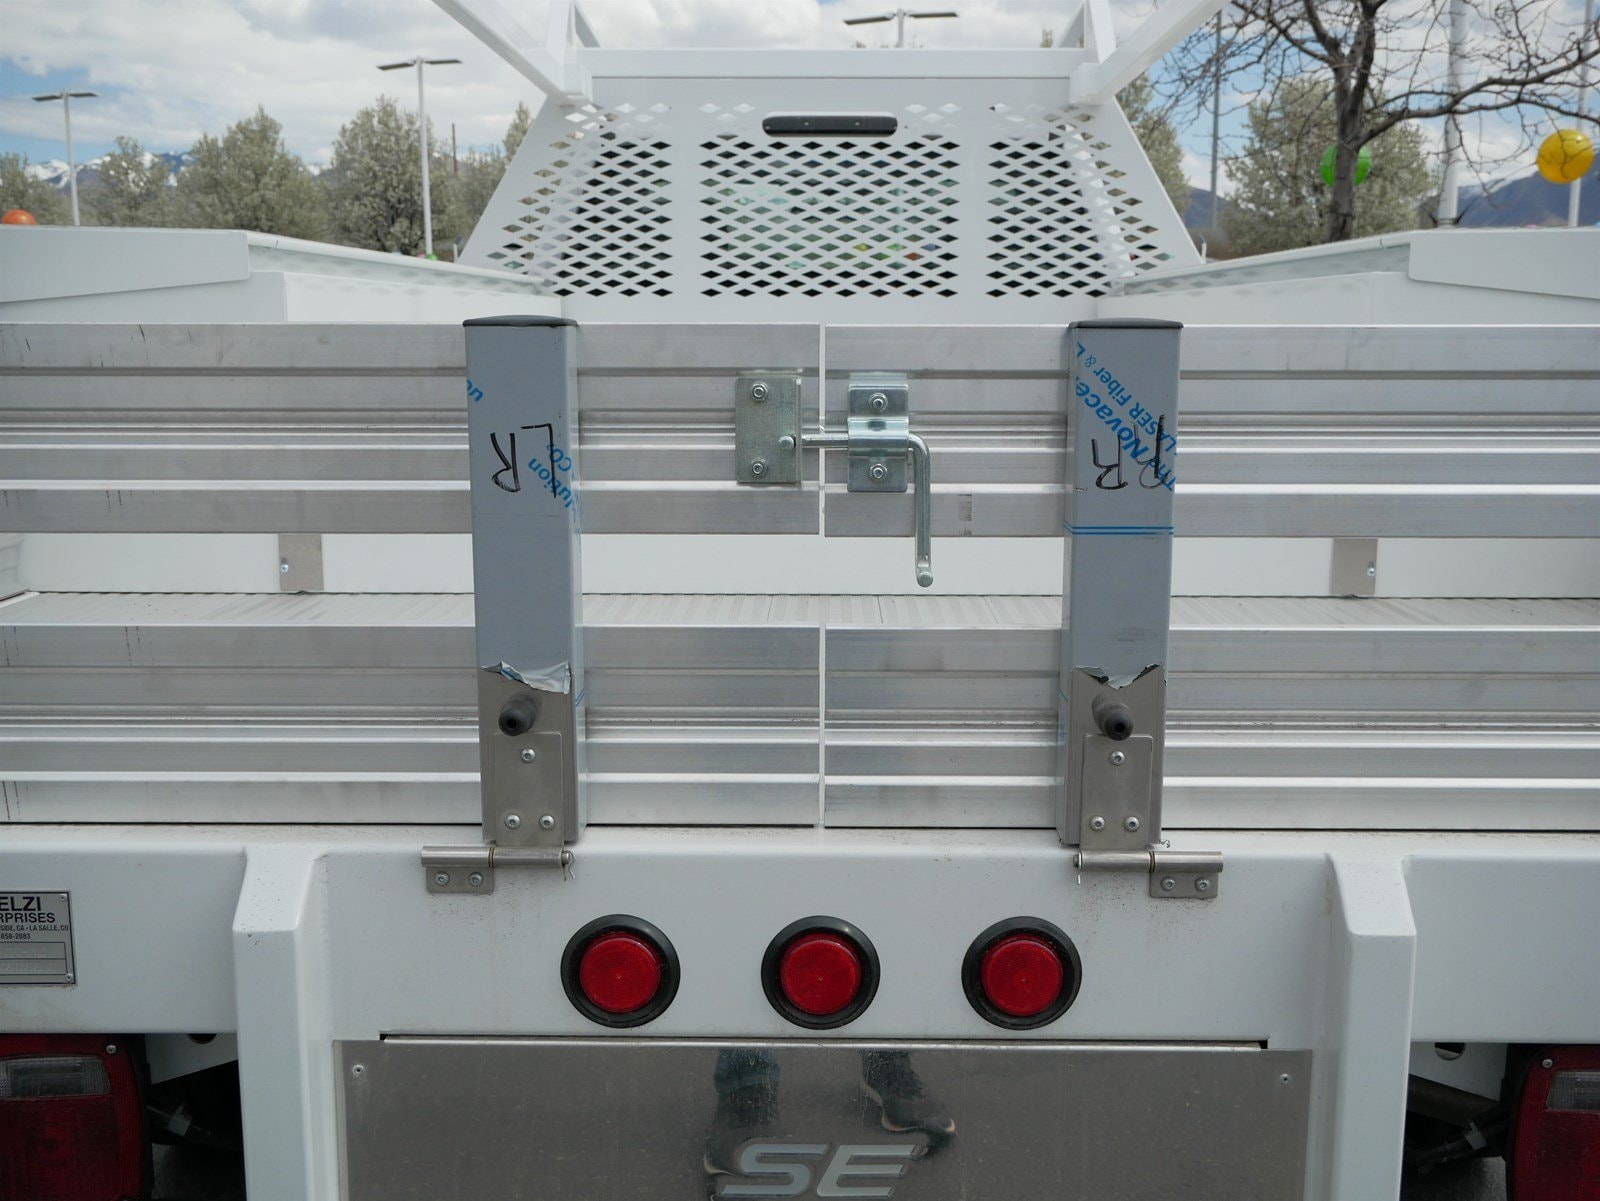 2020 F-550 Regular Cab DRW 4x4, Scelzi CTFB Contractor Body #63090 - photo 28